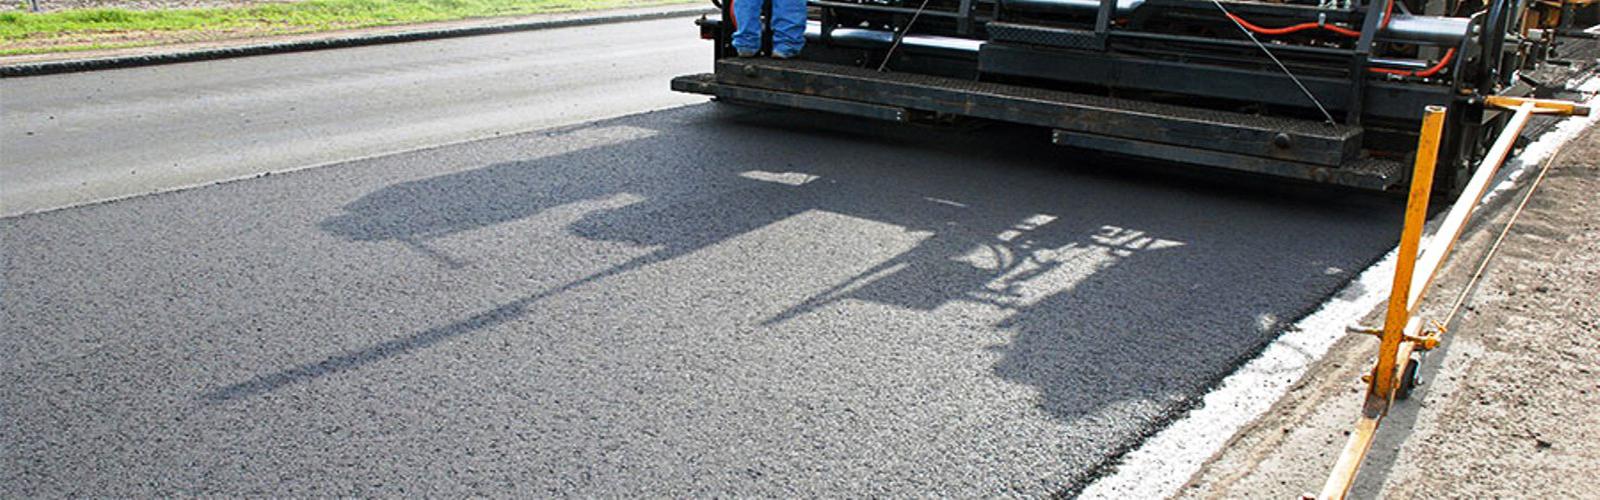 Cutback Bitumen or Liquid Bitumen